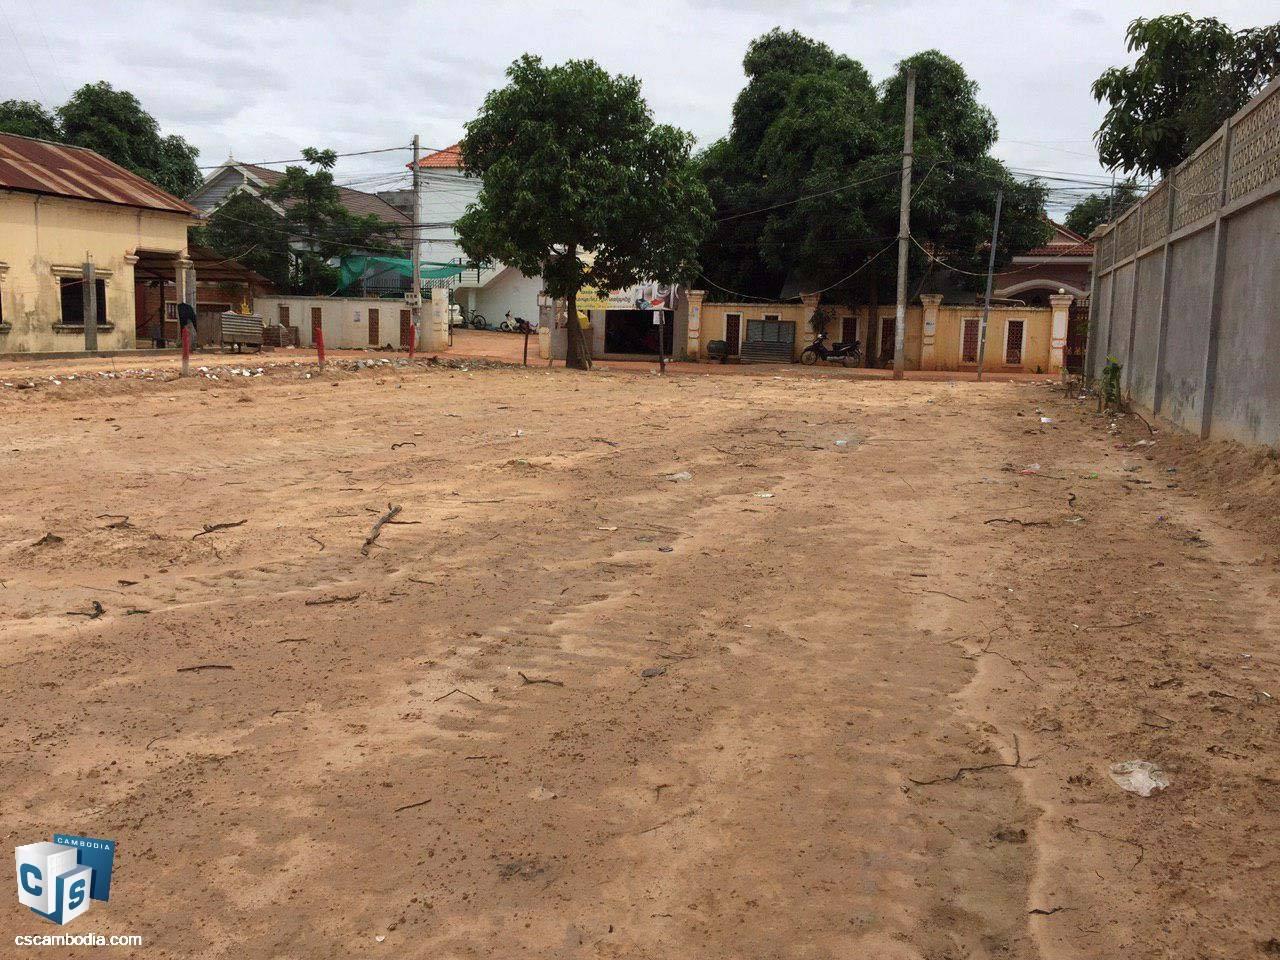 406 Sq Meters Of Land – For Sale – Sala Kanseng Village – Svay Dangkum Commune –Siem Reap